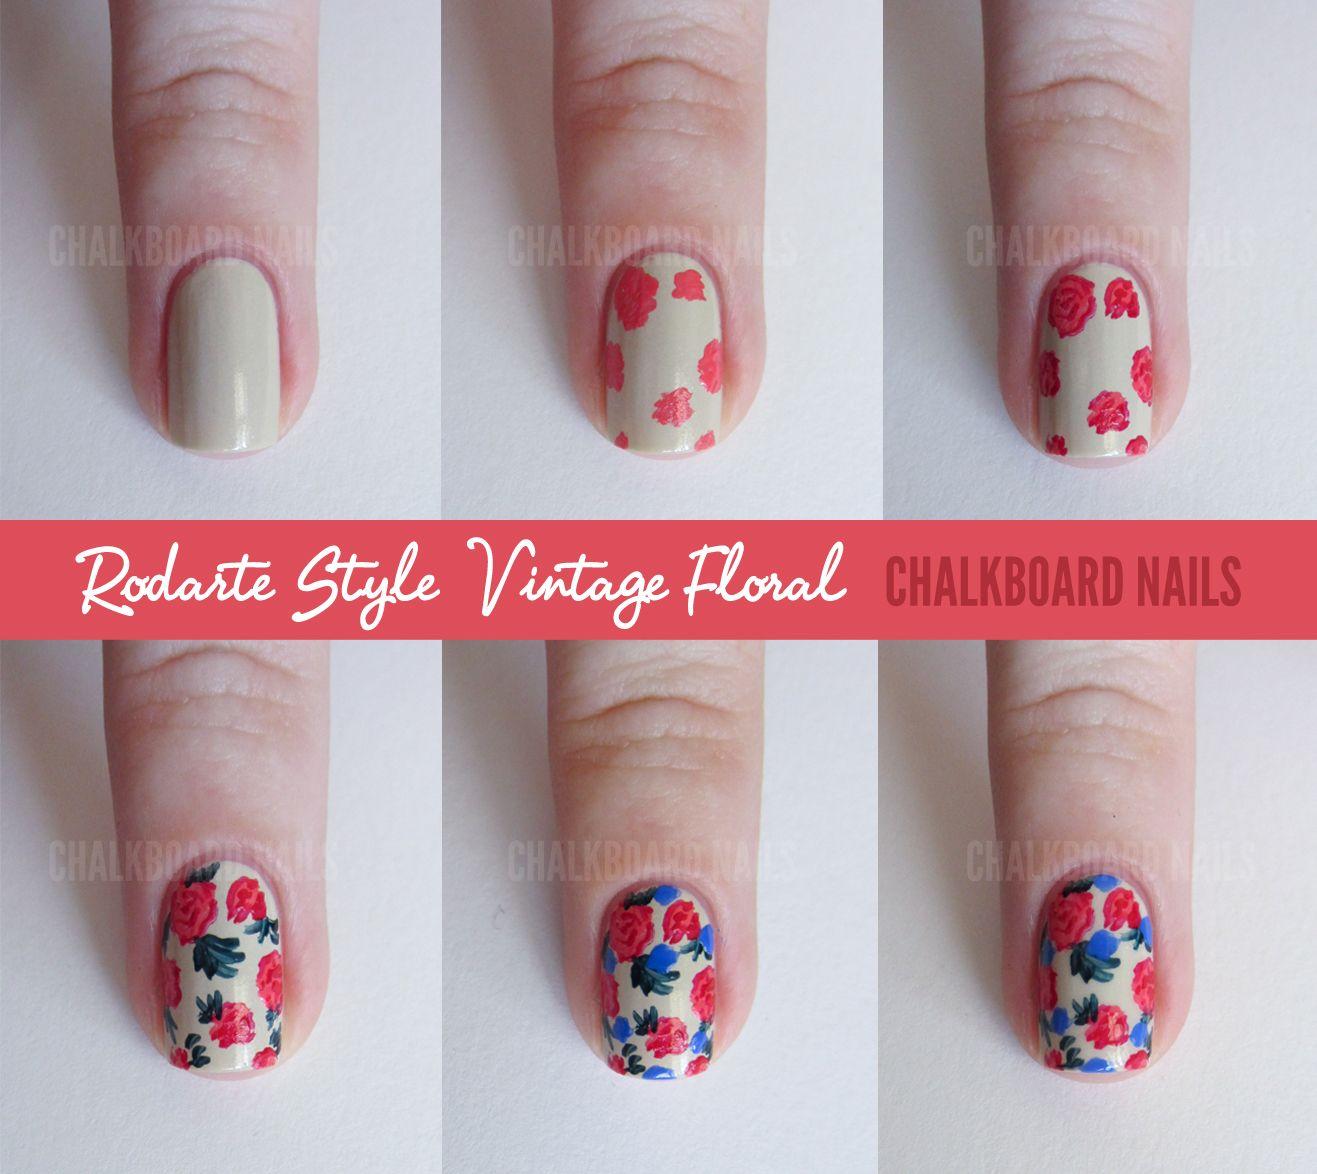 Sally hansen x rodarte tie dye and floral mix tutorial chalkboard nails sally hansen x rodarte tie dye and floral mix tutorial prinsesfo Choice Image